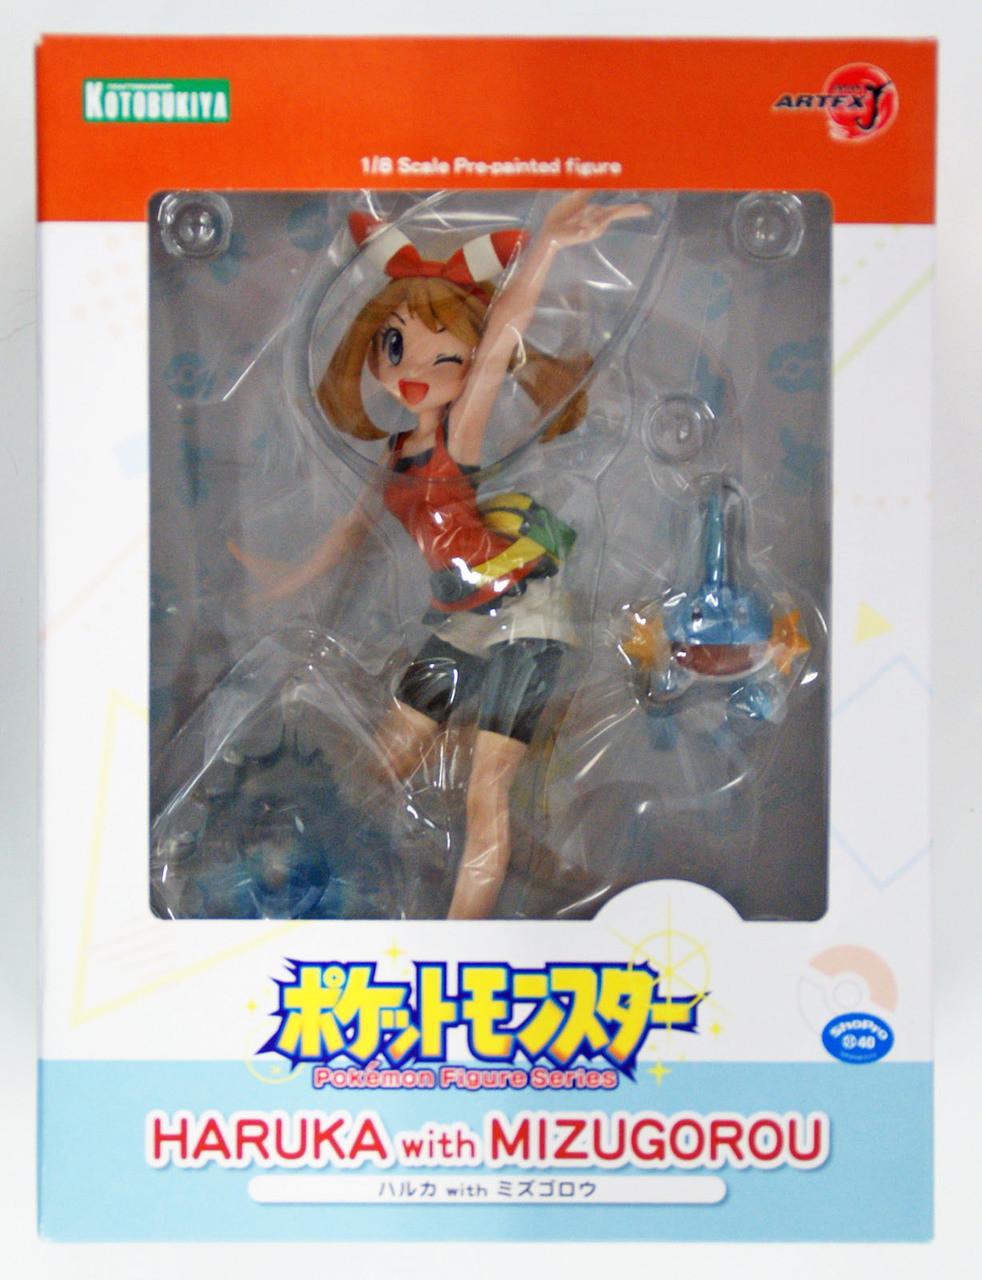 Kotobukiya ARTFX J Pokemon Series Rosa Mei with Snivy 1//8 Scale PVC Figure